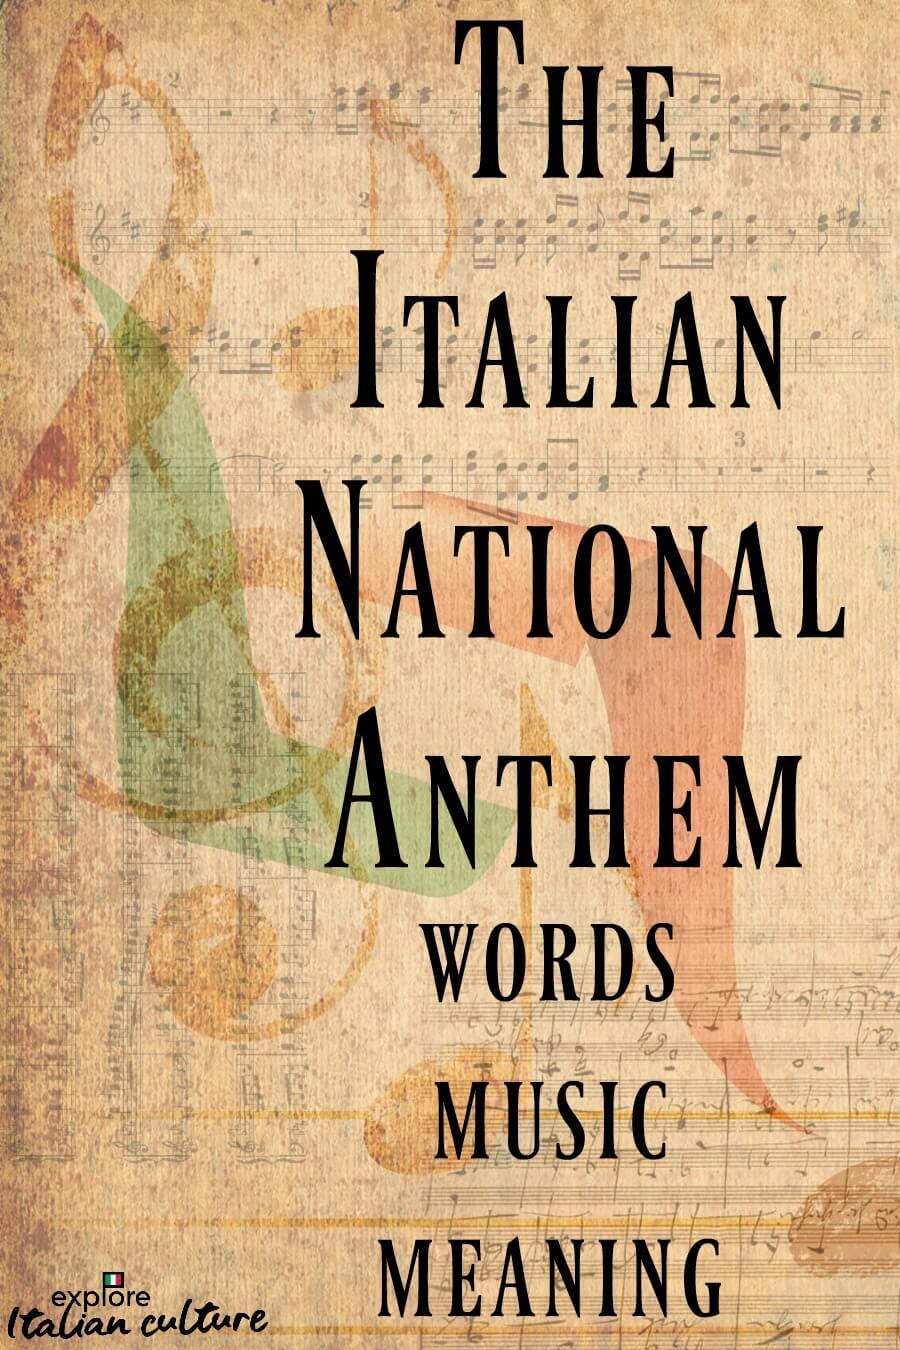 Italian national anthem